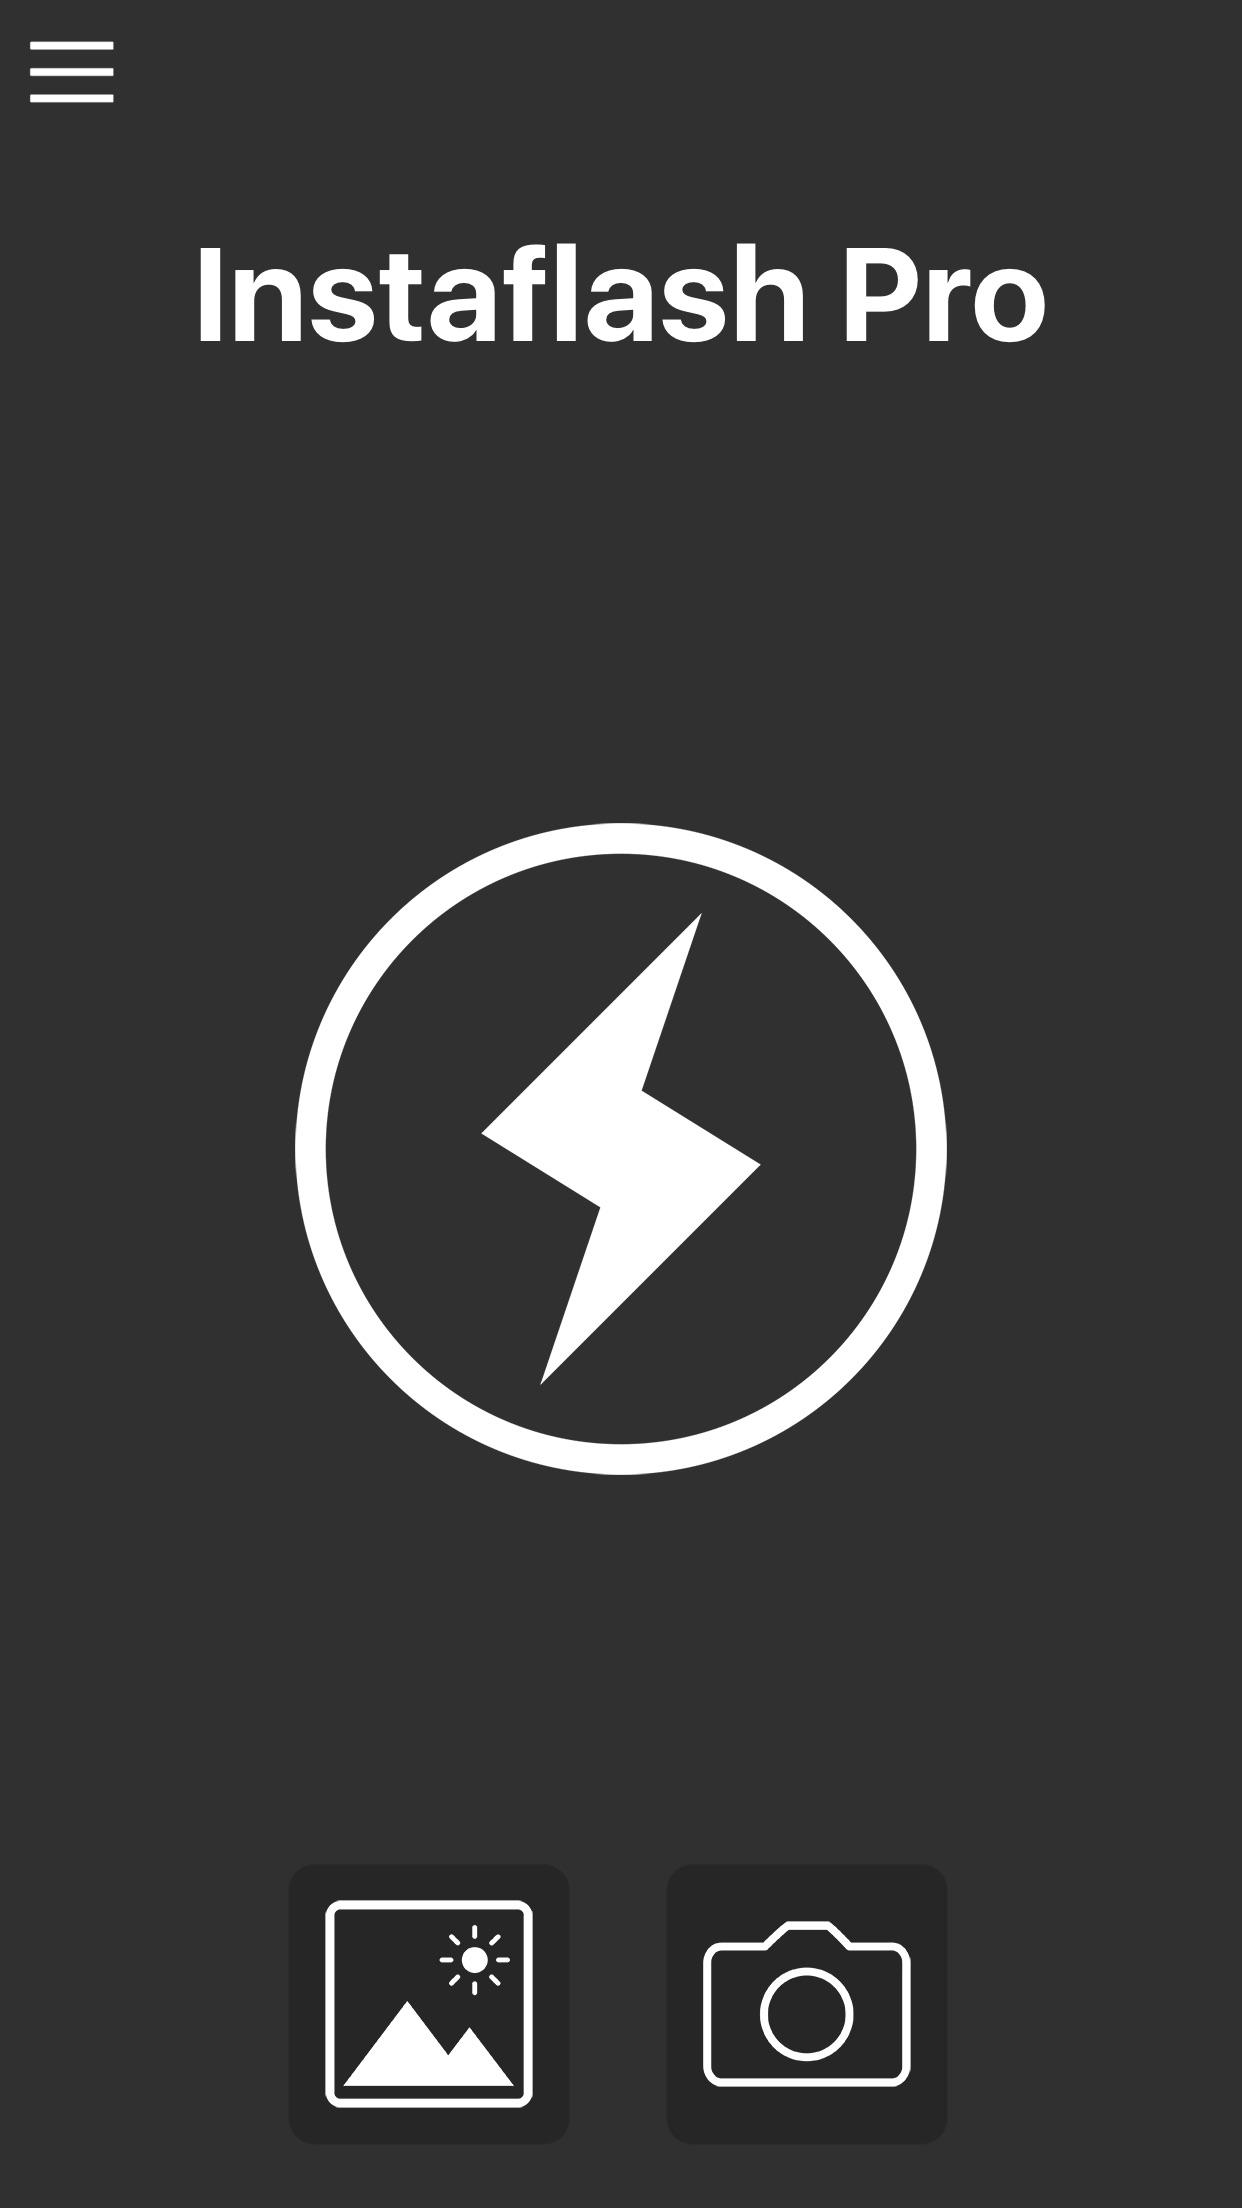 Instaflash Pro Screenshot